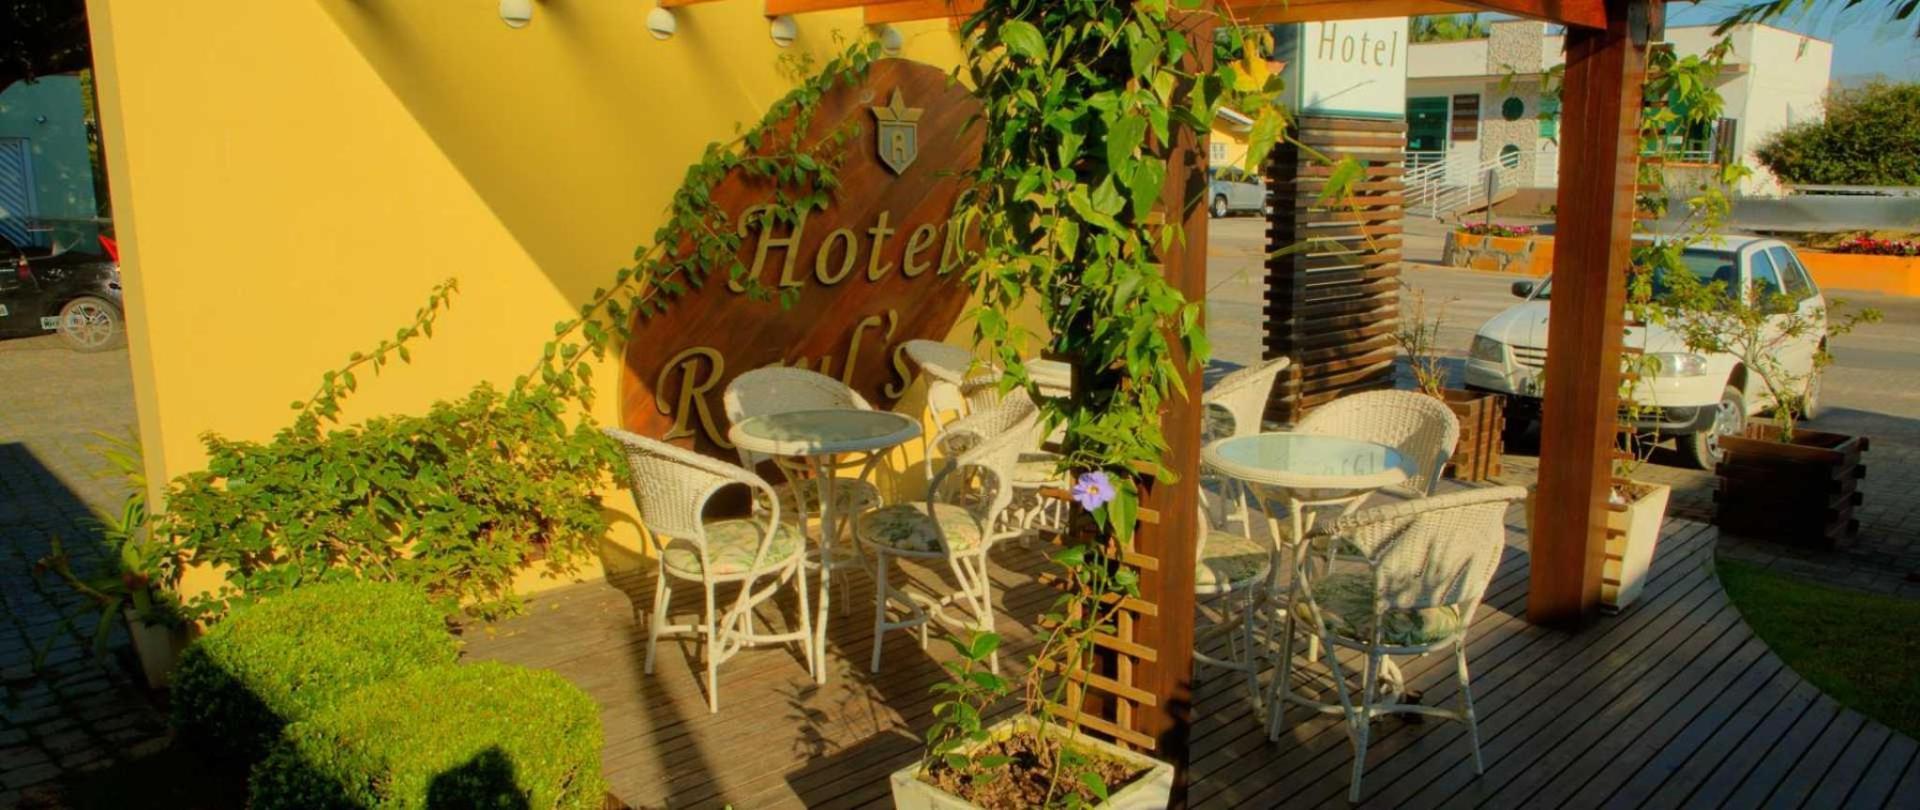 Hotel Raul's